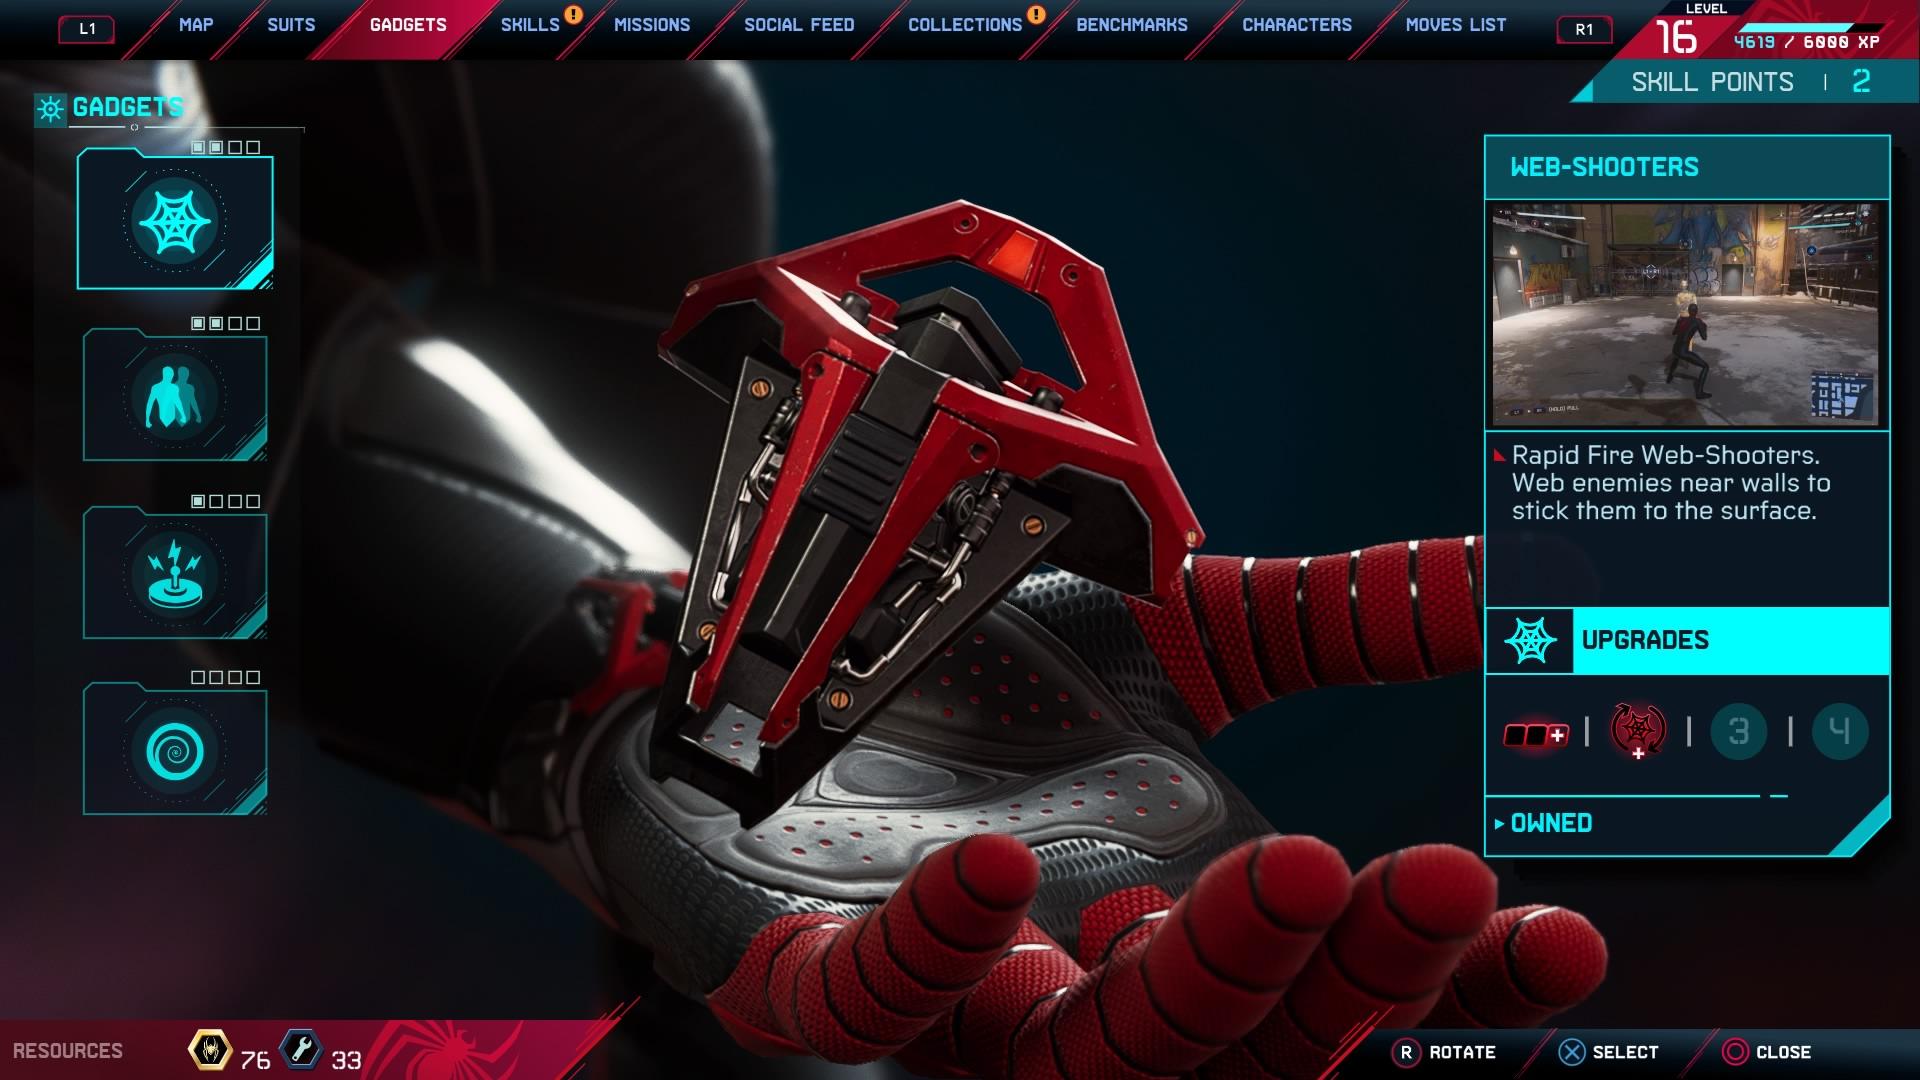 Marvel's Spider-Man: Miles Morales - Gadgets